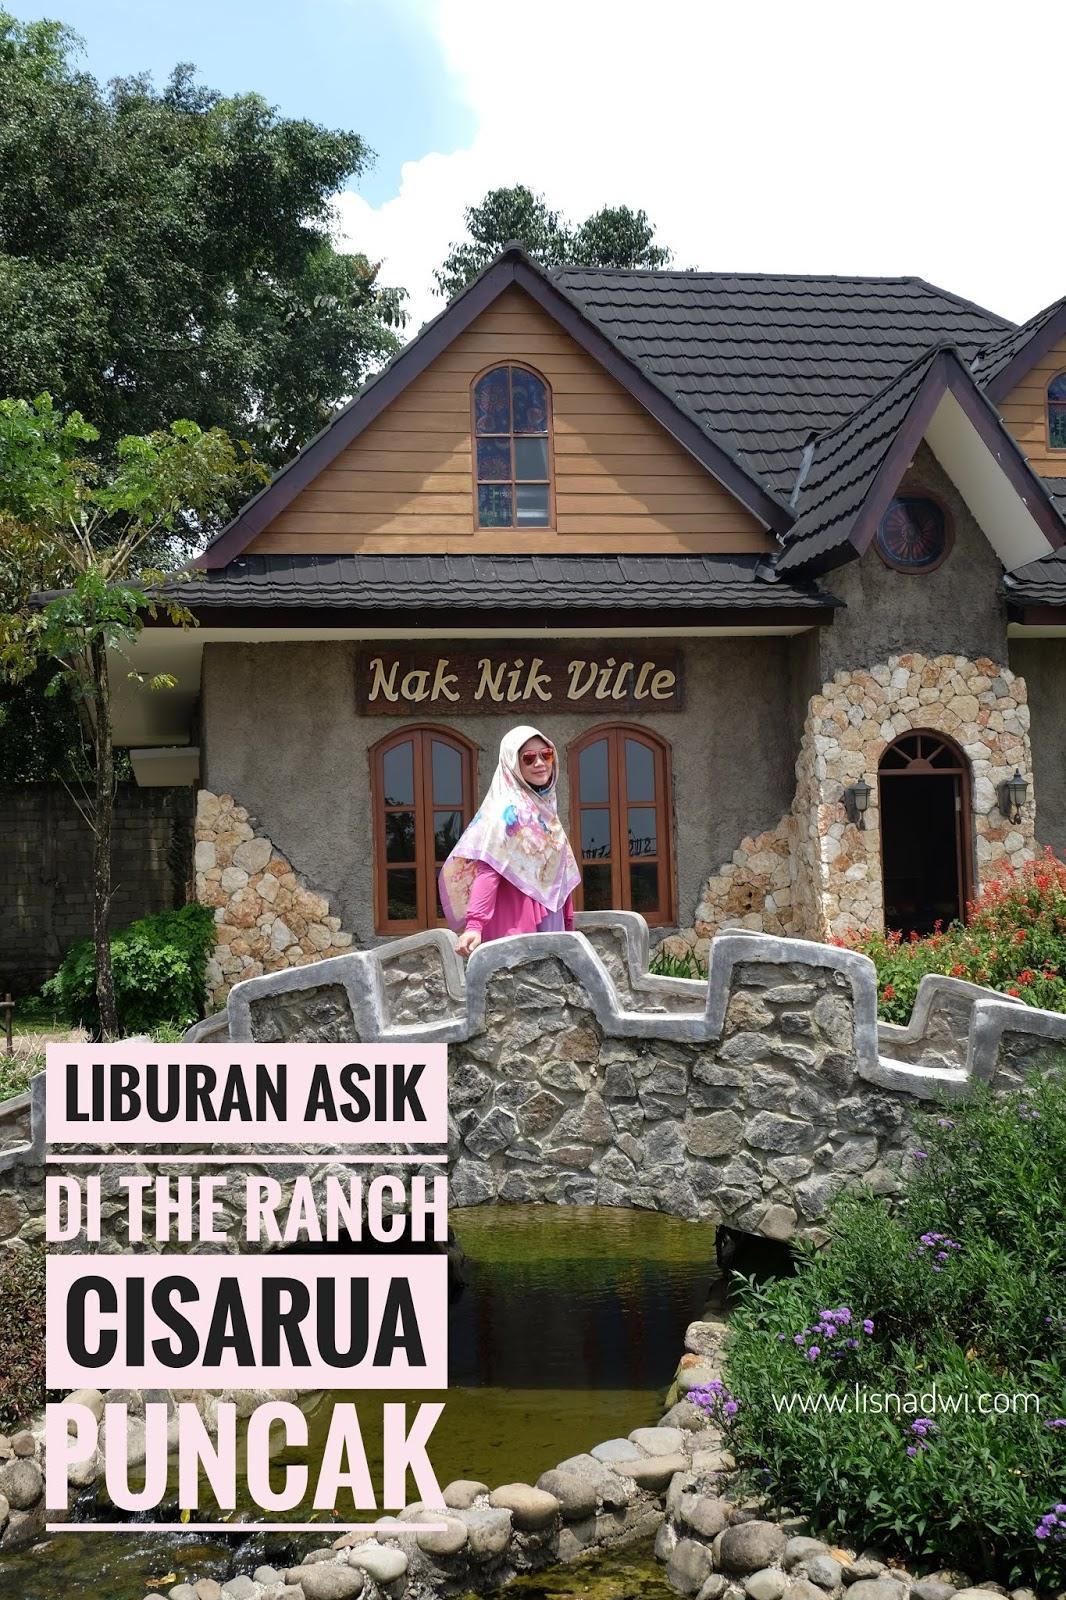 Liburan Asik Di The Ranch Cisarua Puncak Lisna Dwi A Productive Mom Lifestyle